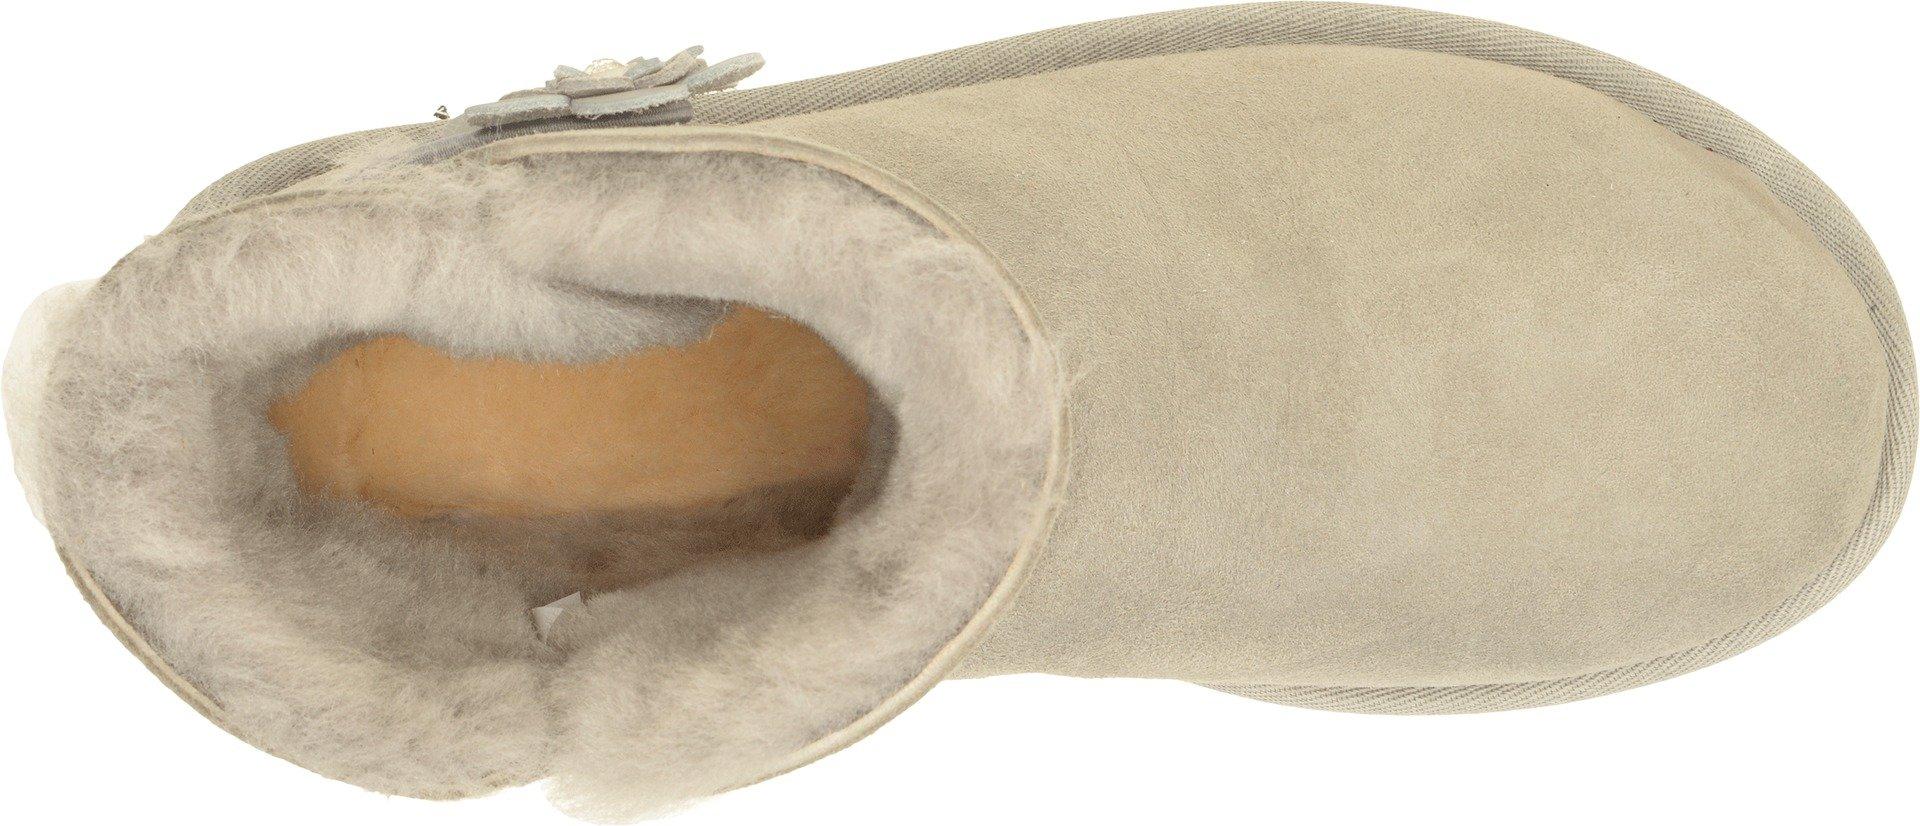 UGG Women's Mini Bailey Petal Seal 7 B US by UGG (Image #2)